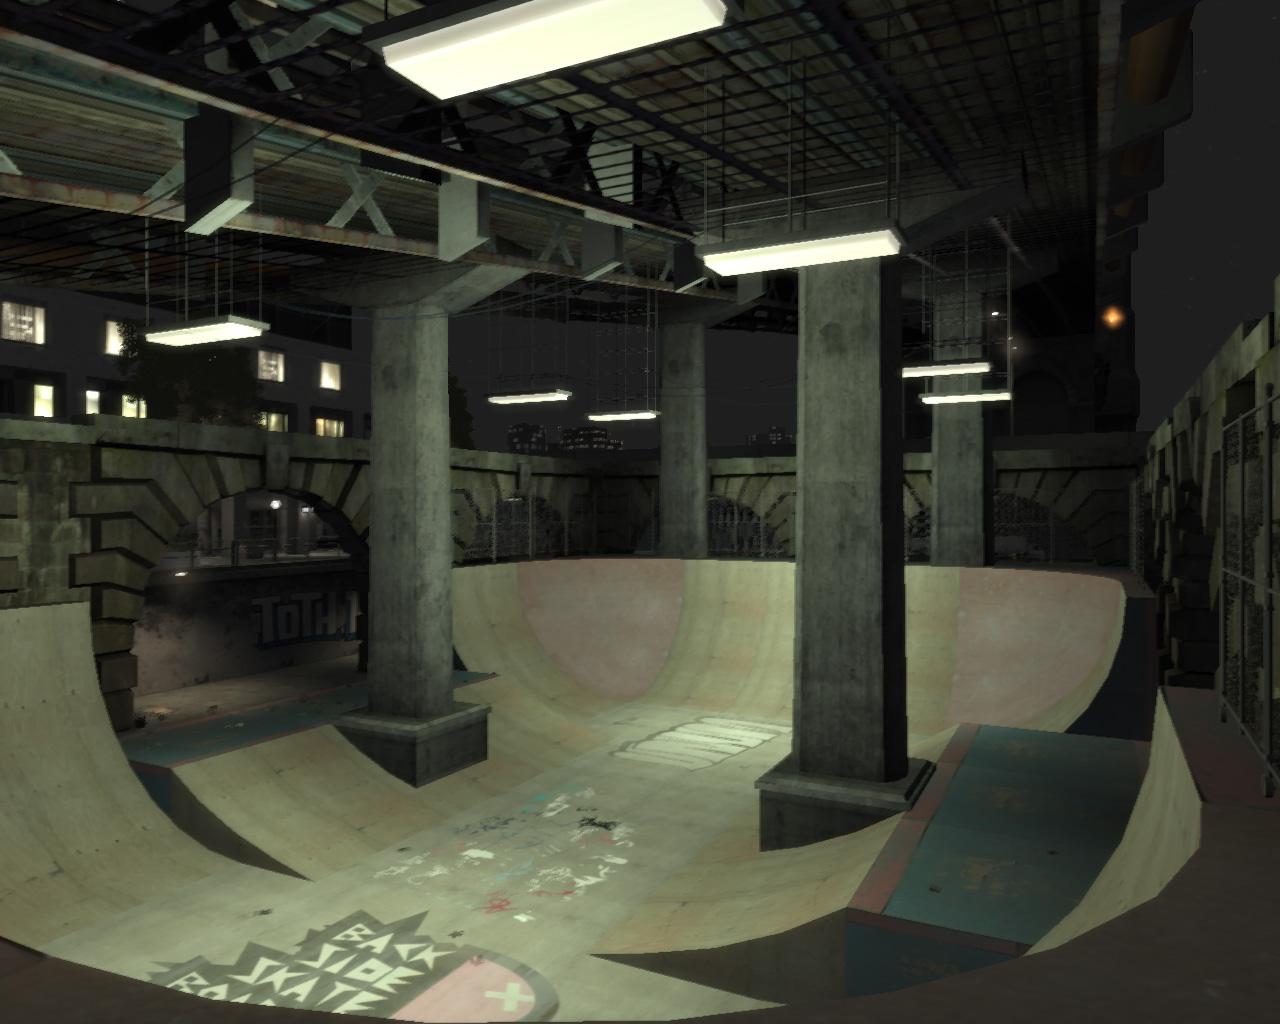 Skate park gta wiki fandom powered by wikia for Andreas fish market